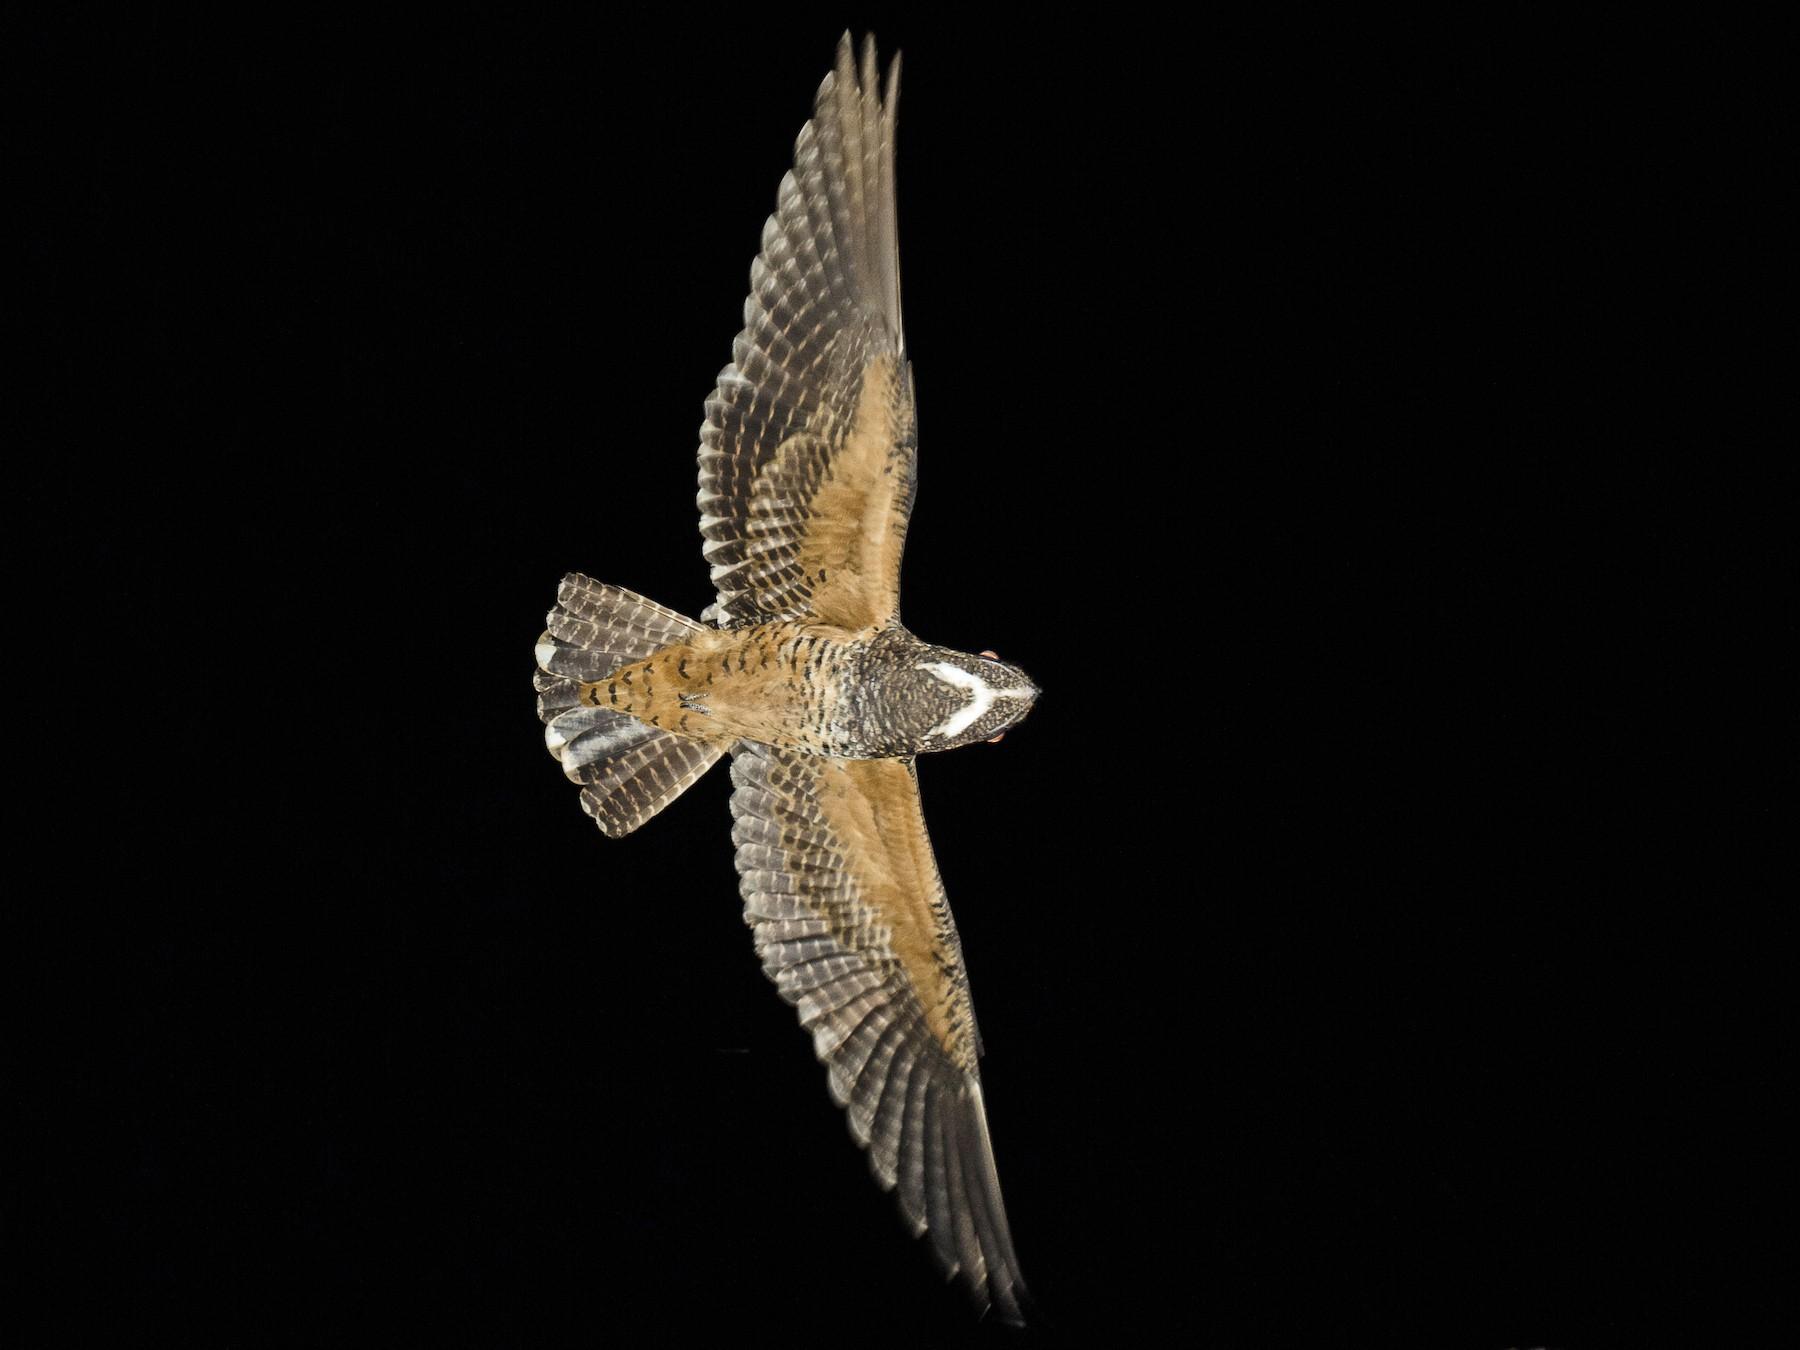 Short-tailed Nighthawk - João Salvador